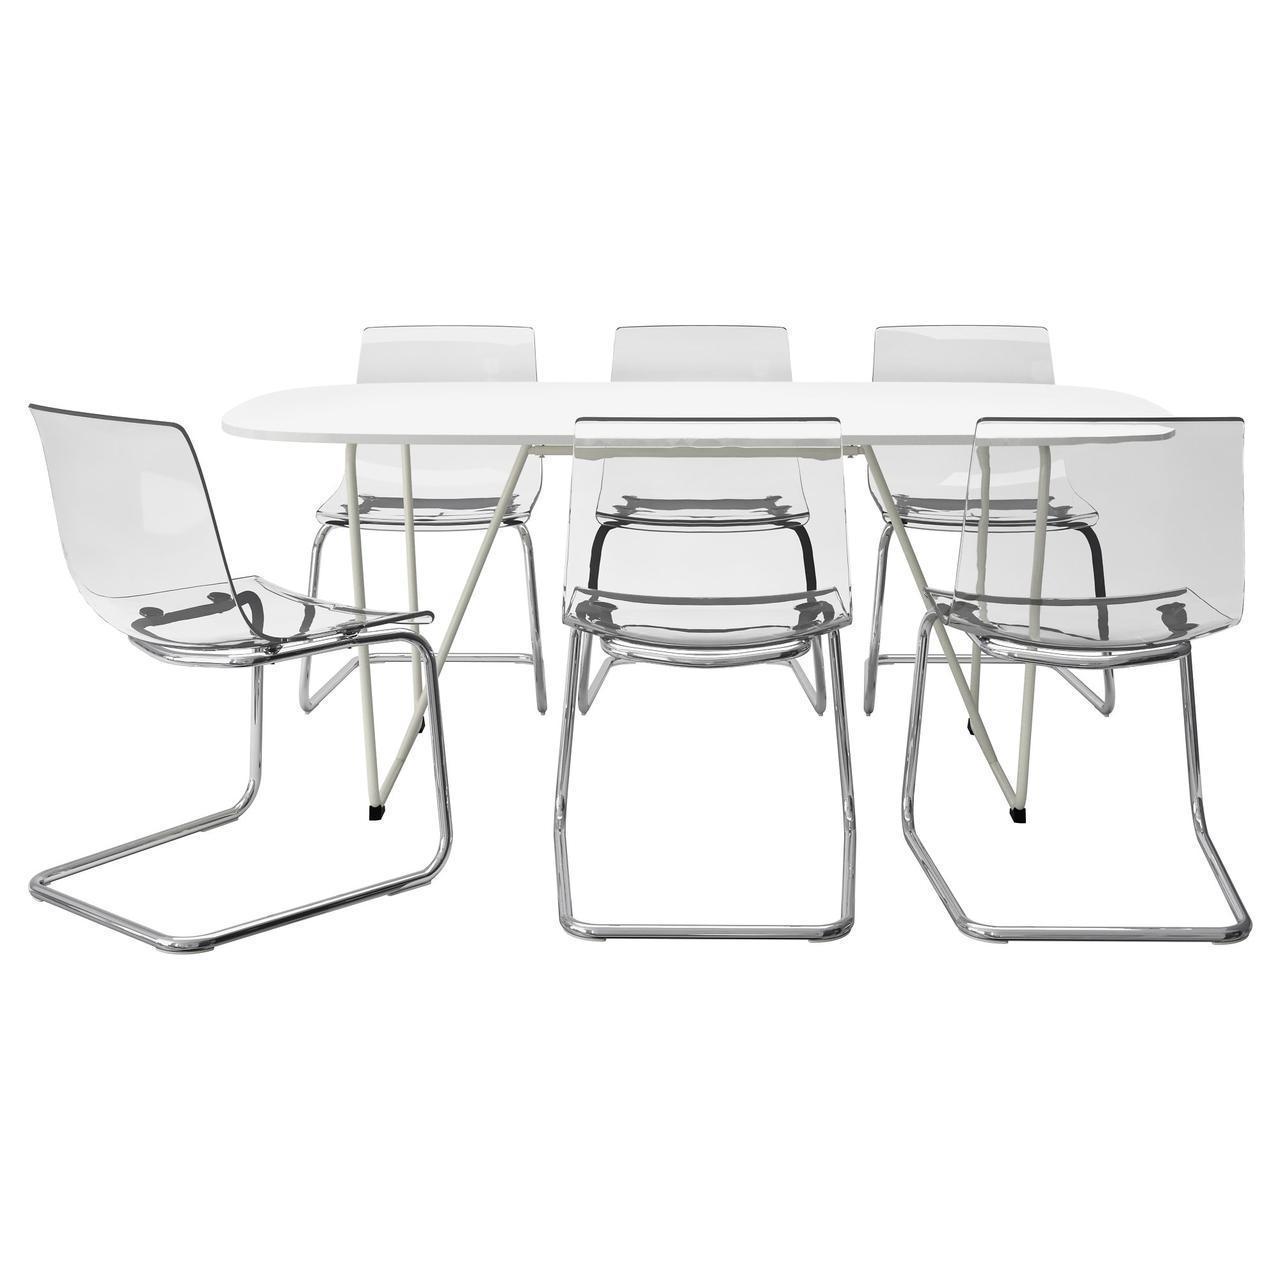 IKEA OPPEBY/BACKARYD / TOBIAS (892.296.88) Стол и 6 стульев, белый, прозрачный хром